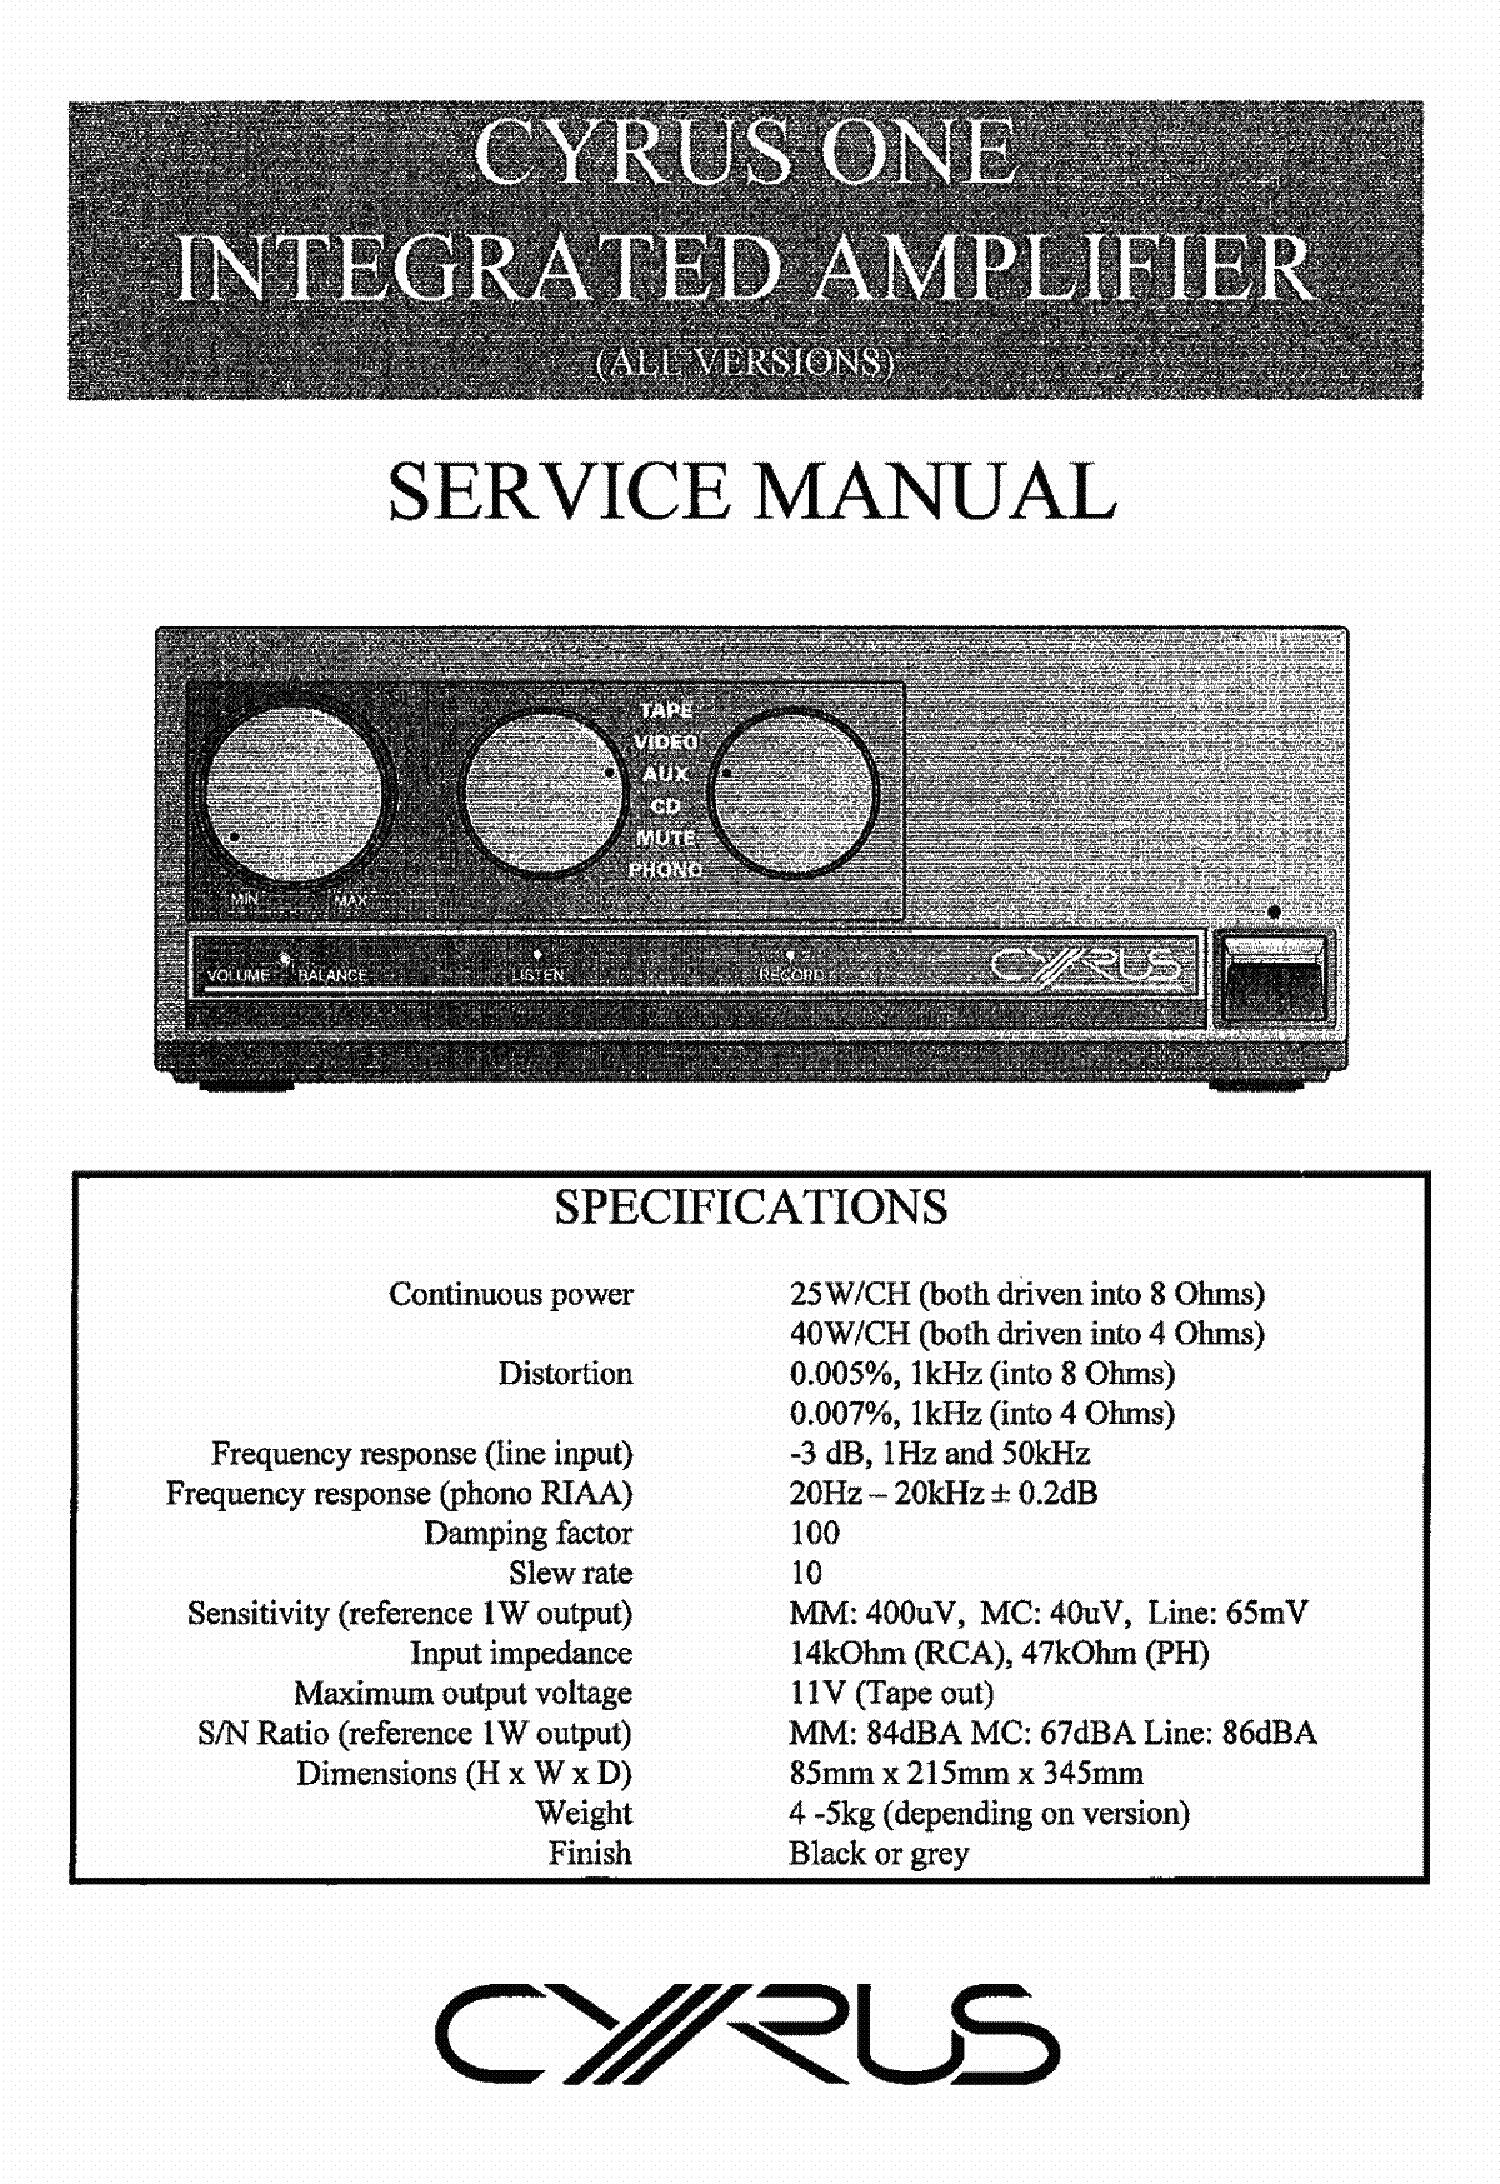 mission amps 5e3 instructions